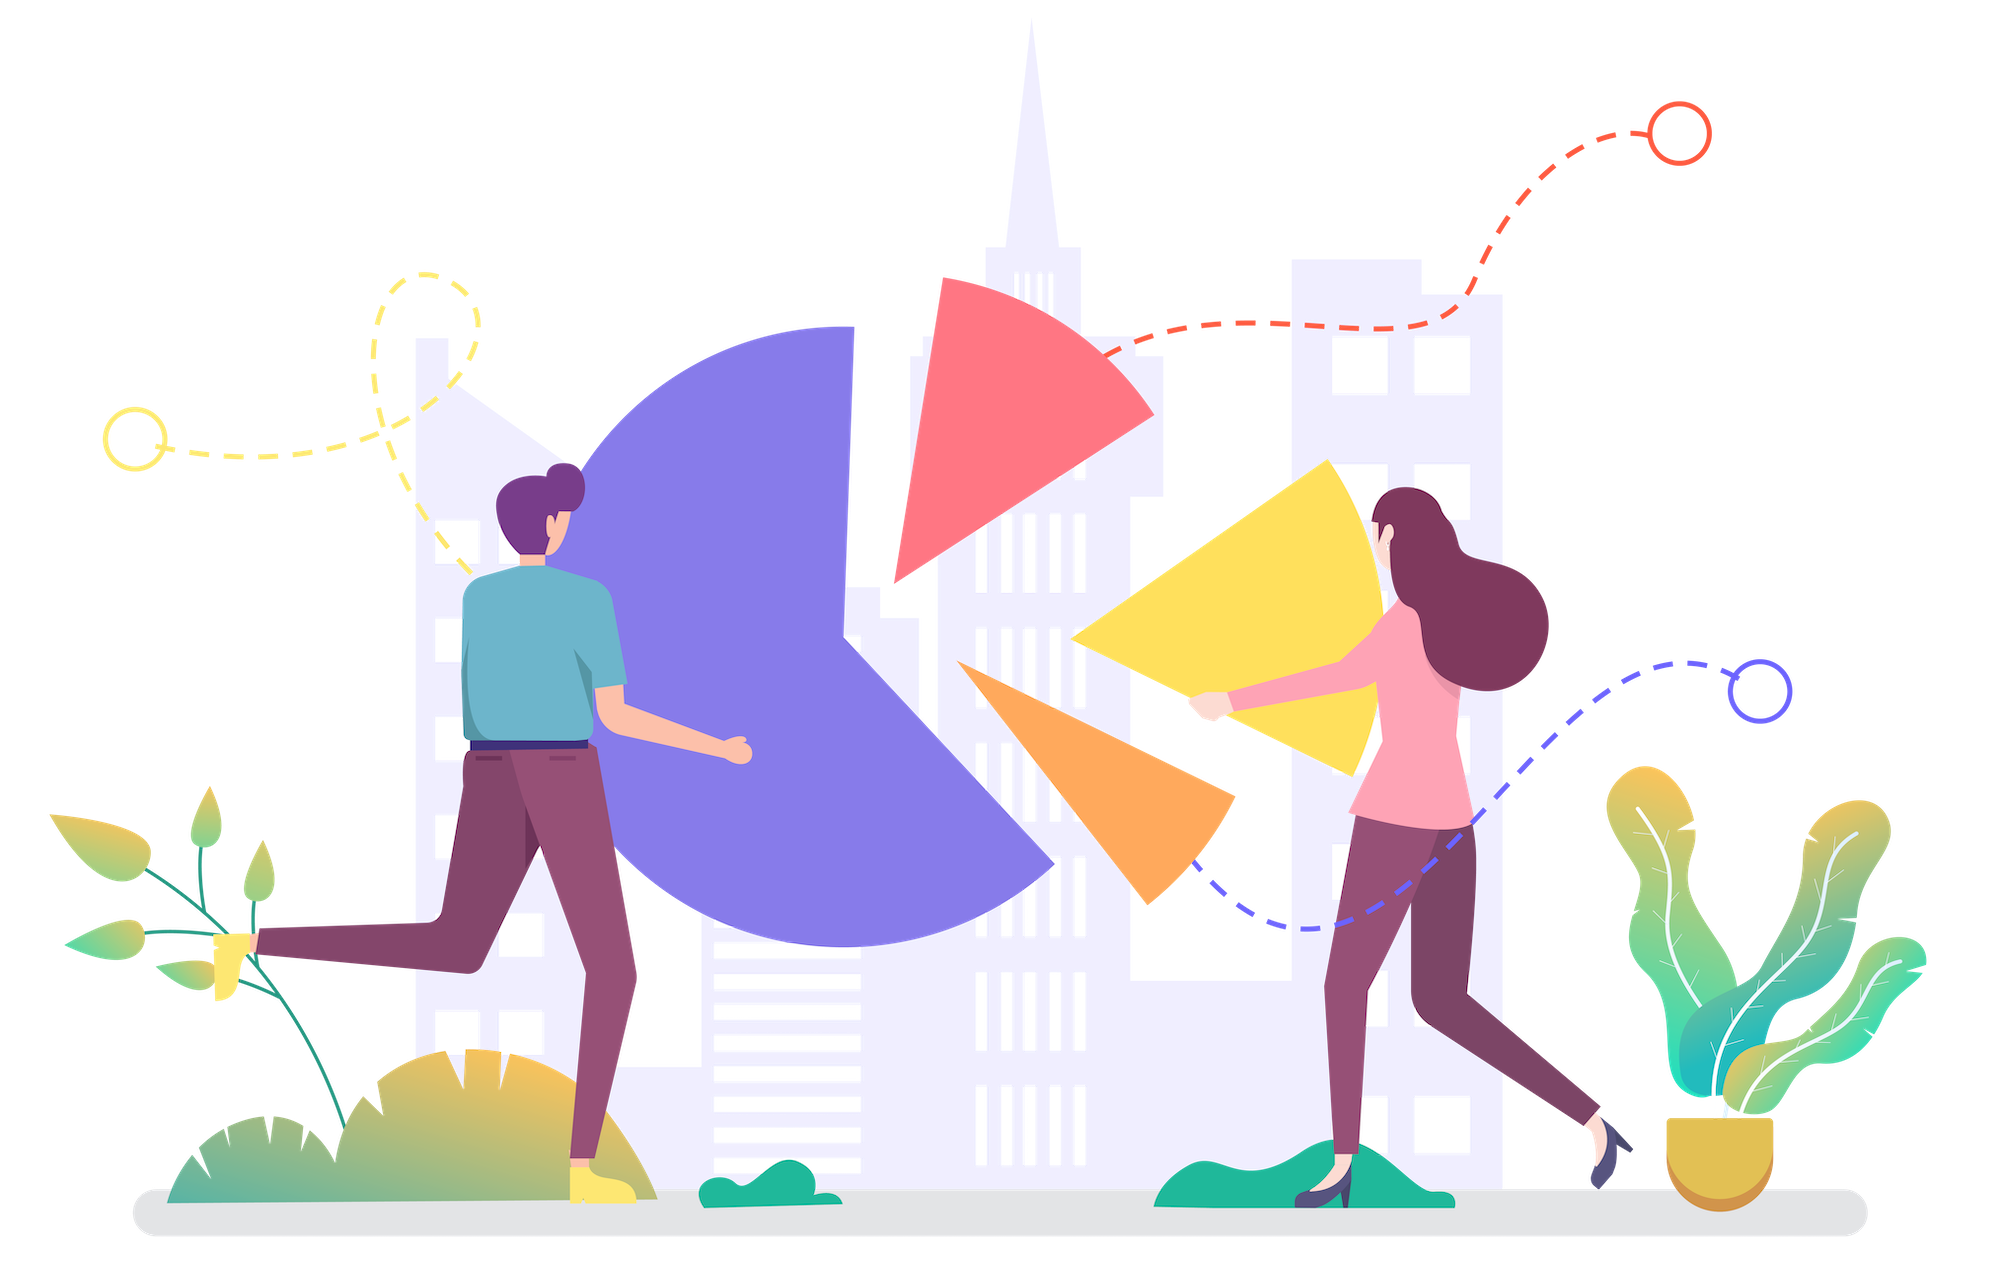 Data Analytics for a Company - Decorative image